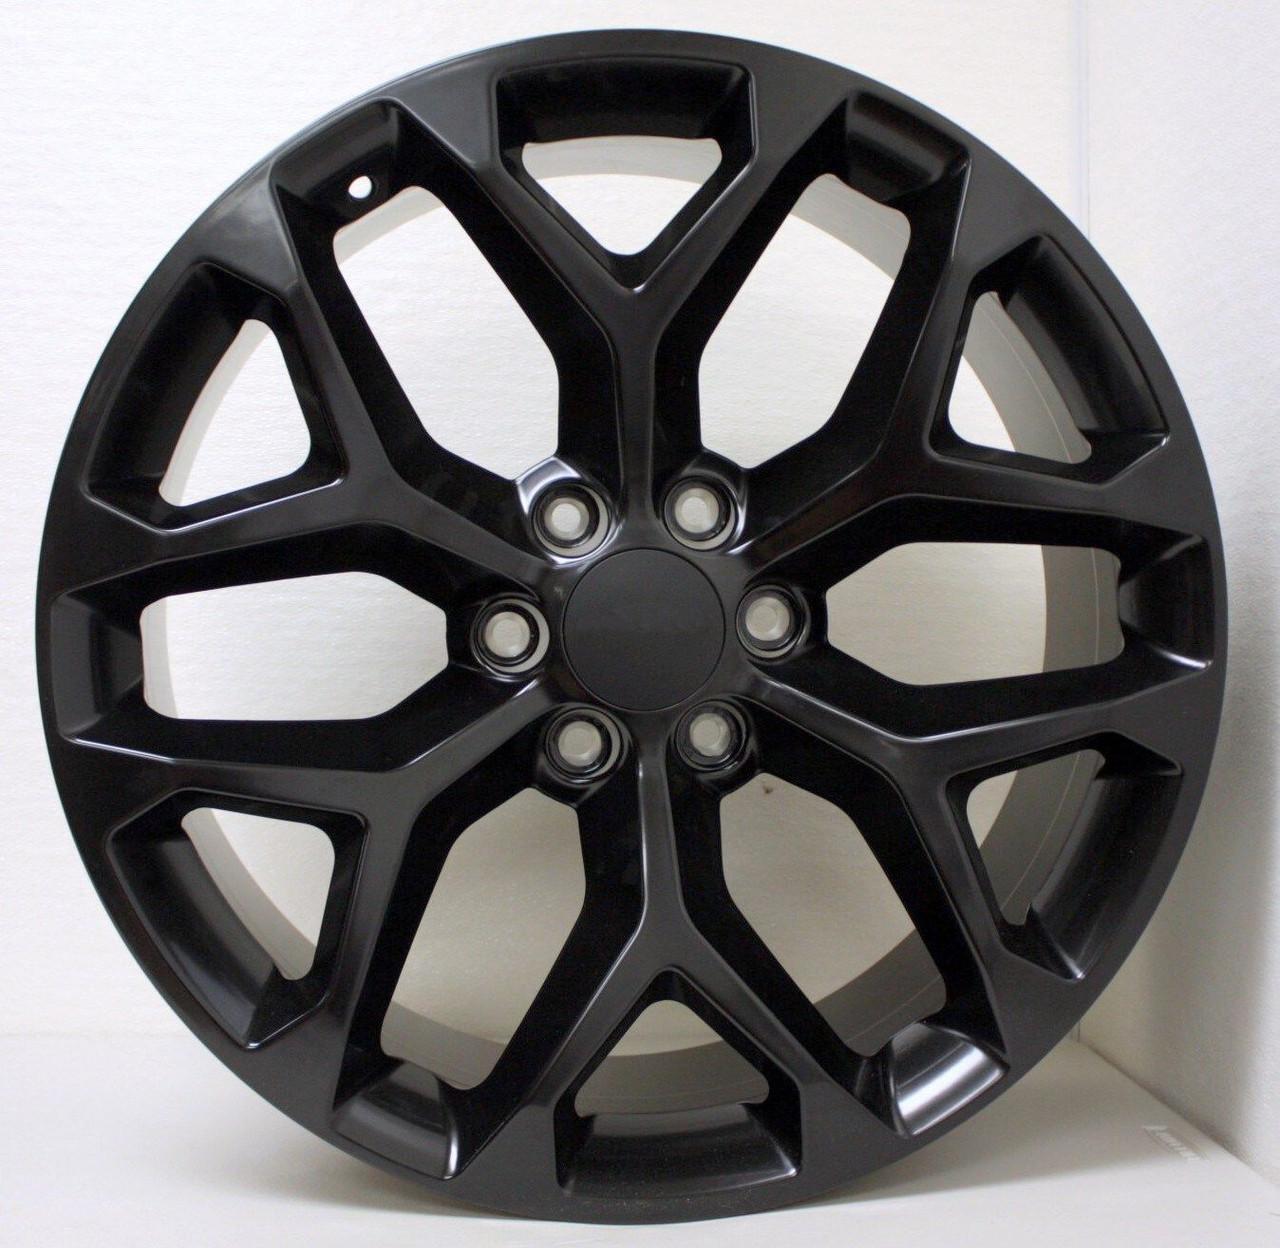 GMC Style Satin Black Snowflake 22 inch Wheels